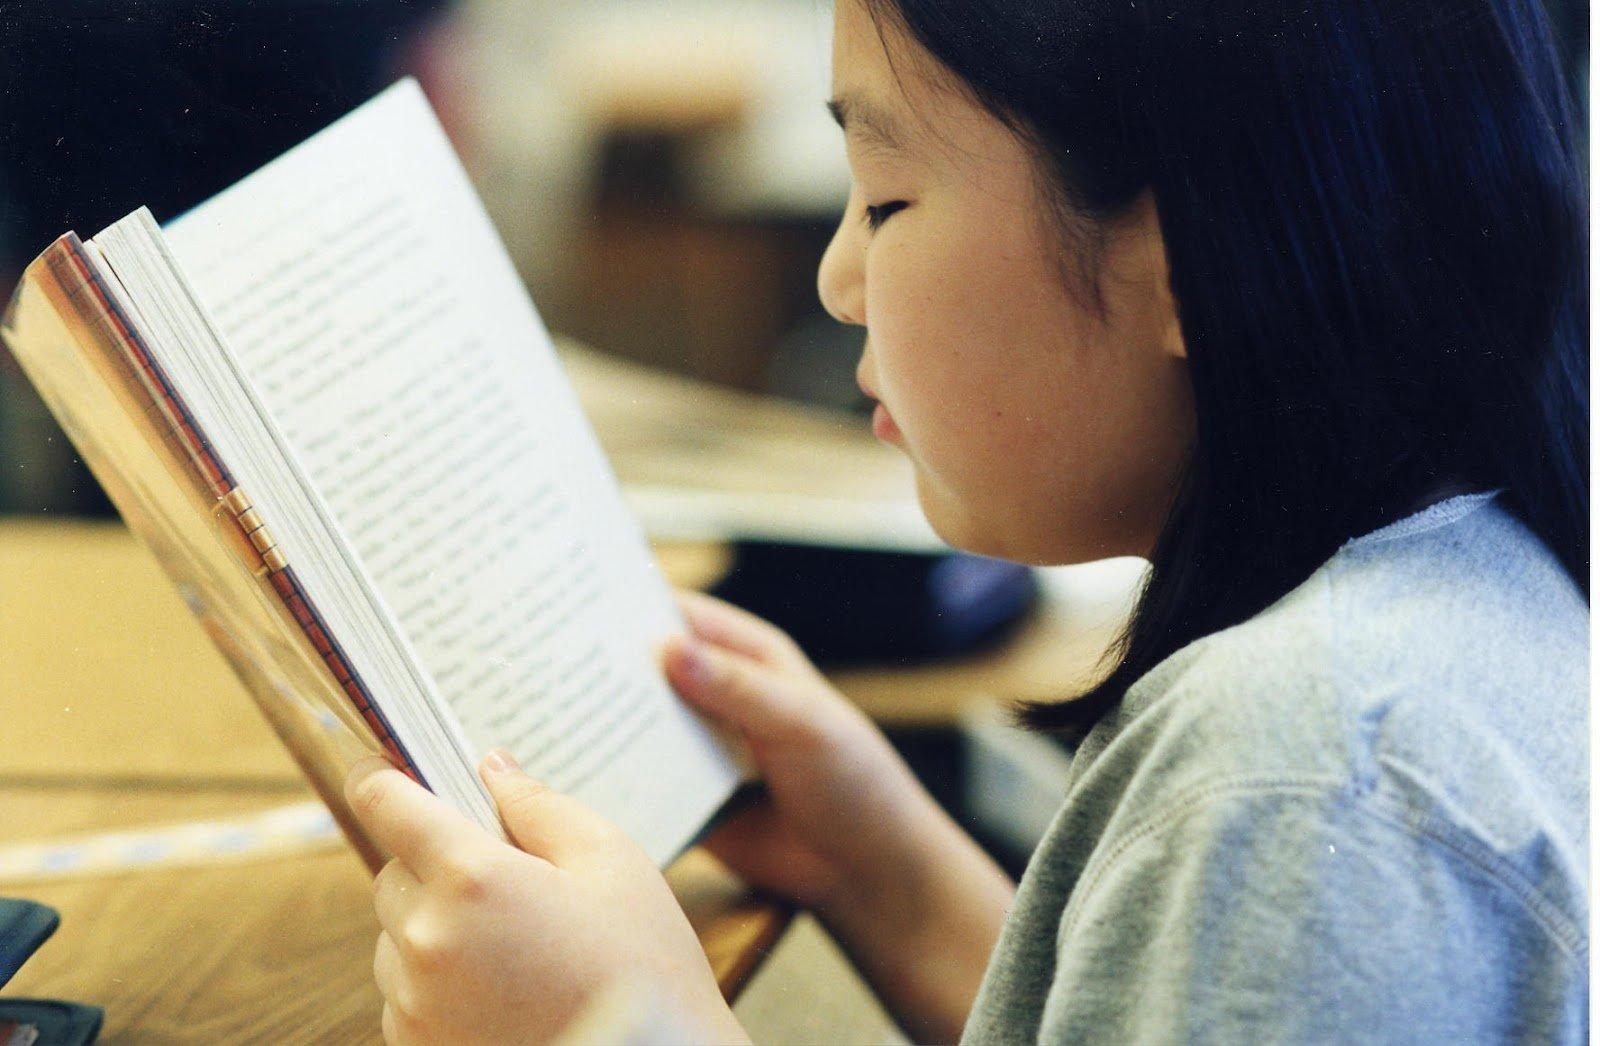 penghambat minat baca anak